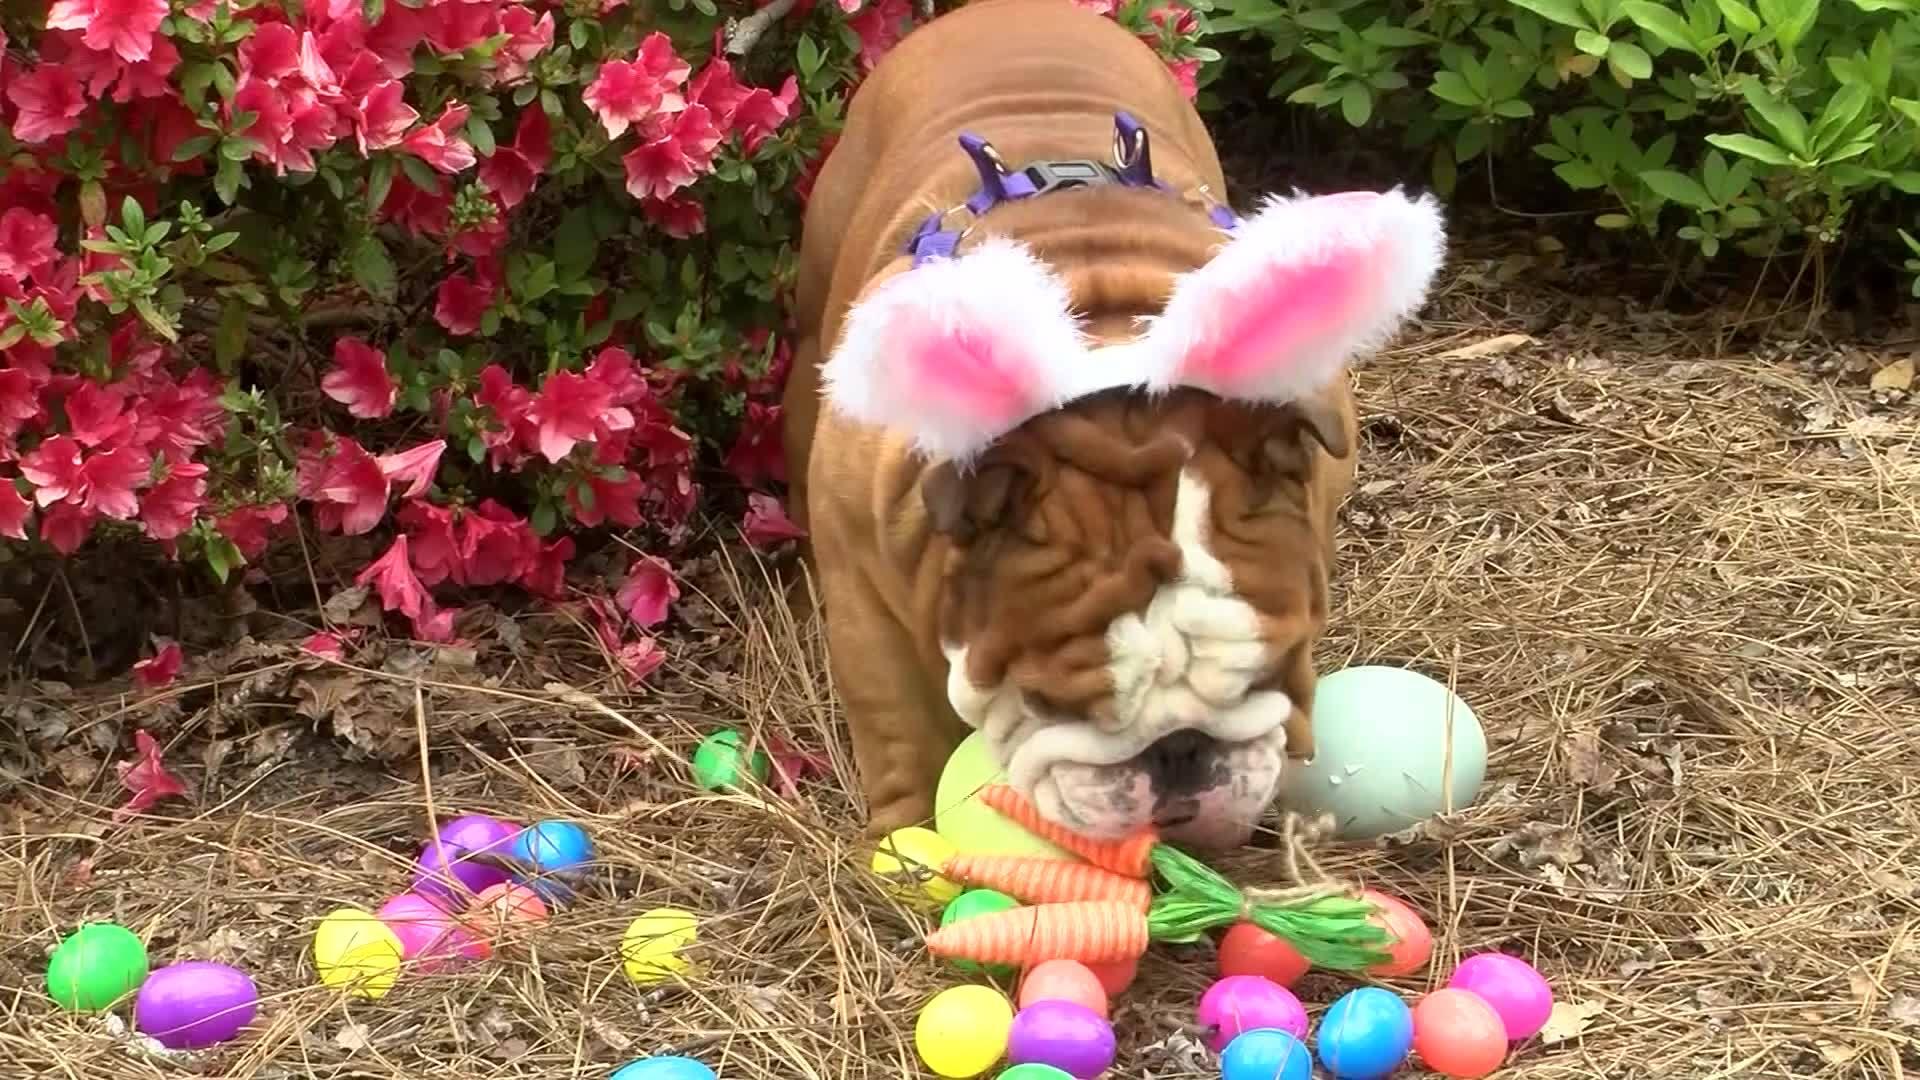 VIDEO: Bulldog named Cadbury's newest 'bunny'